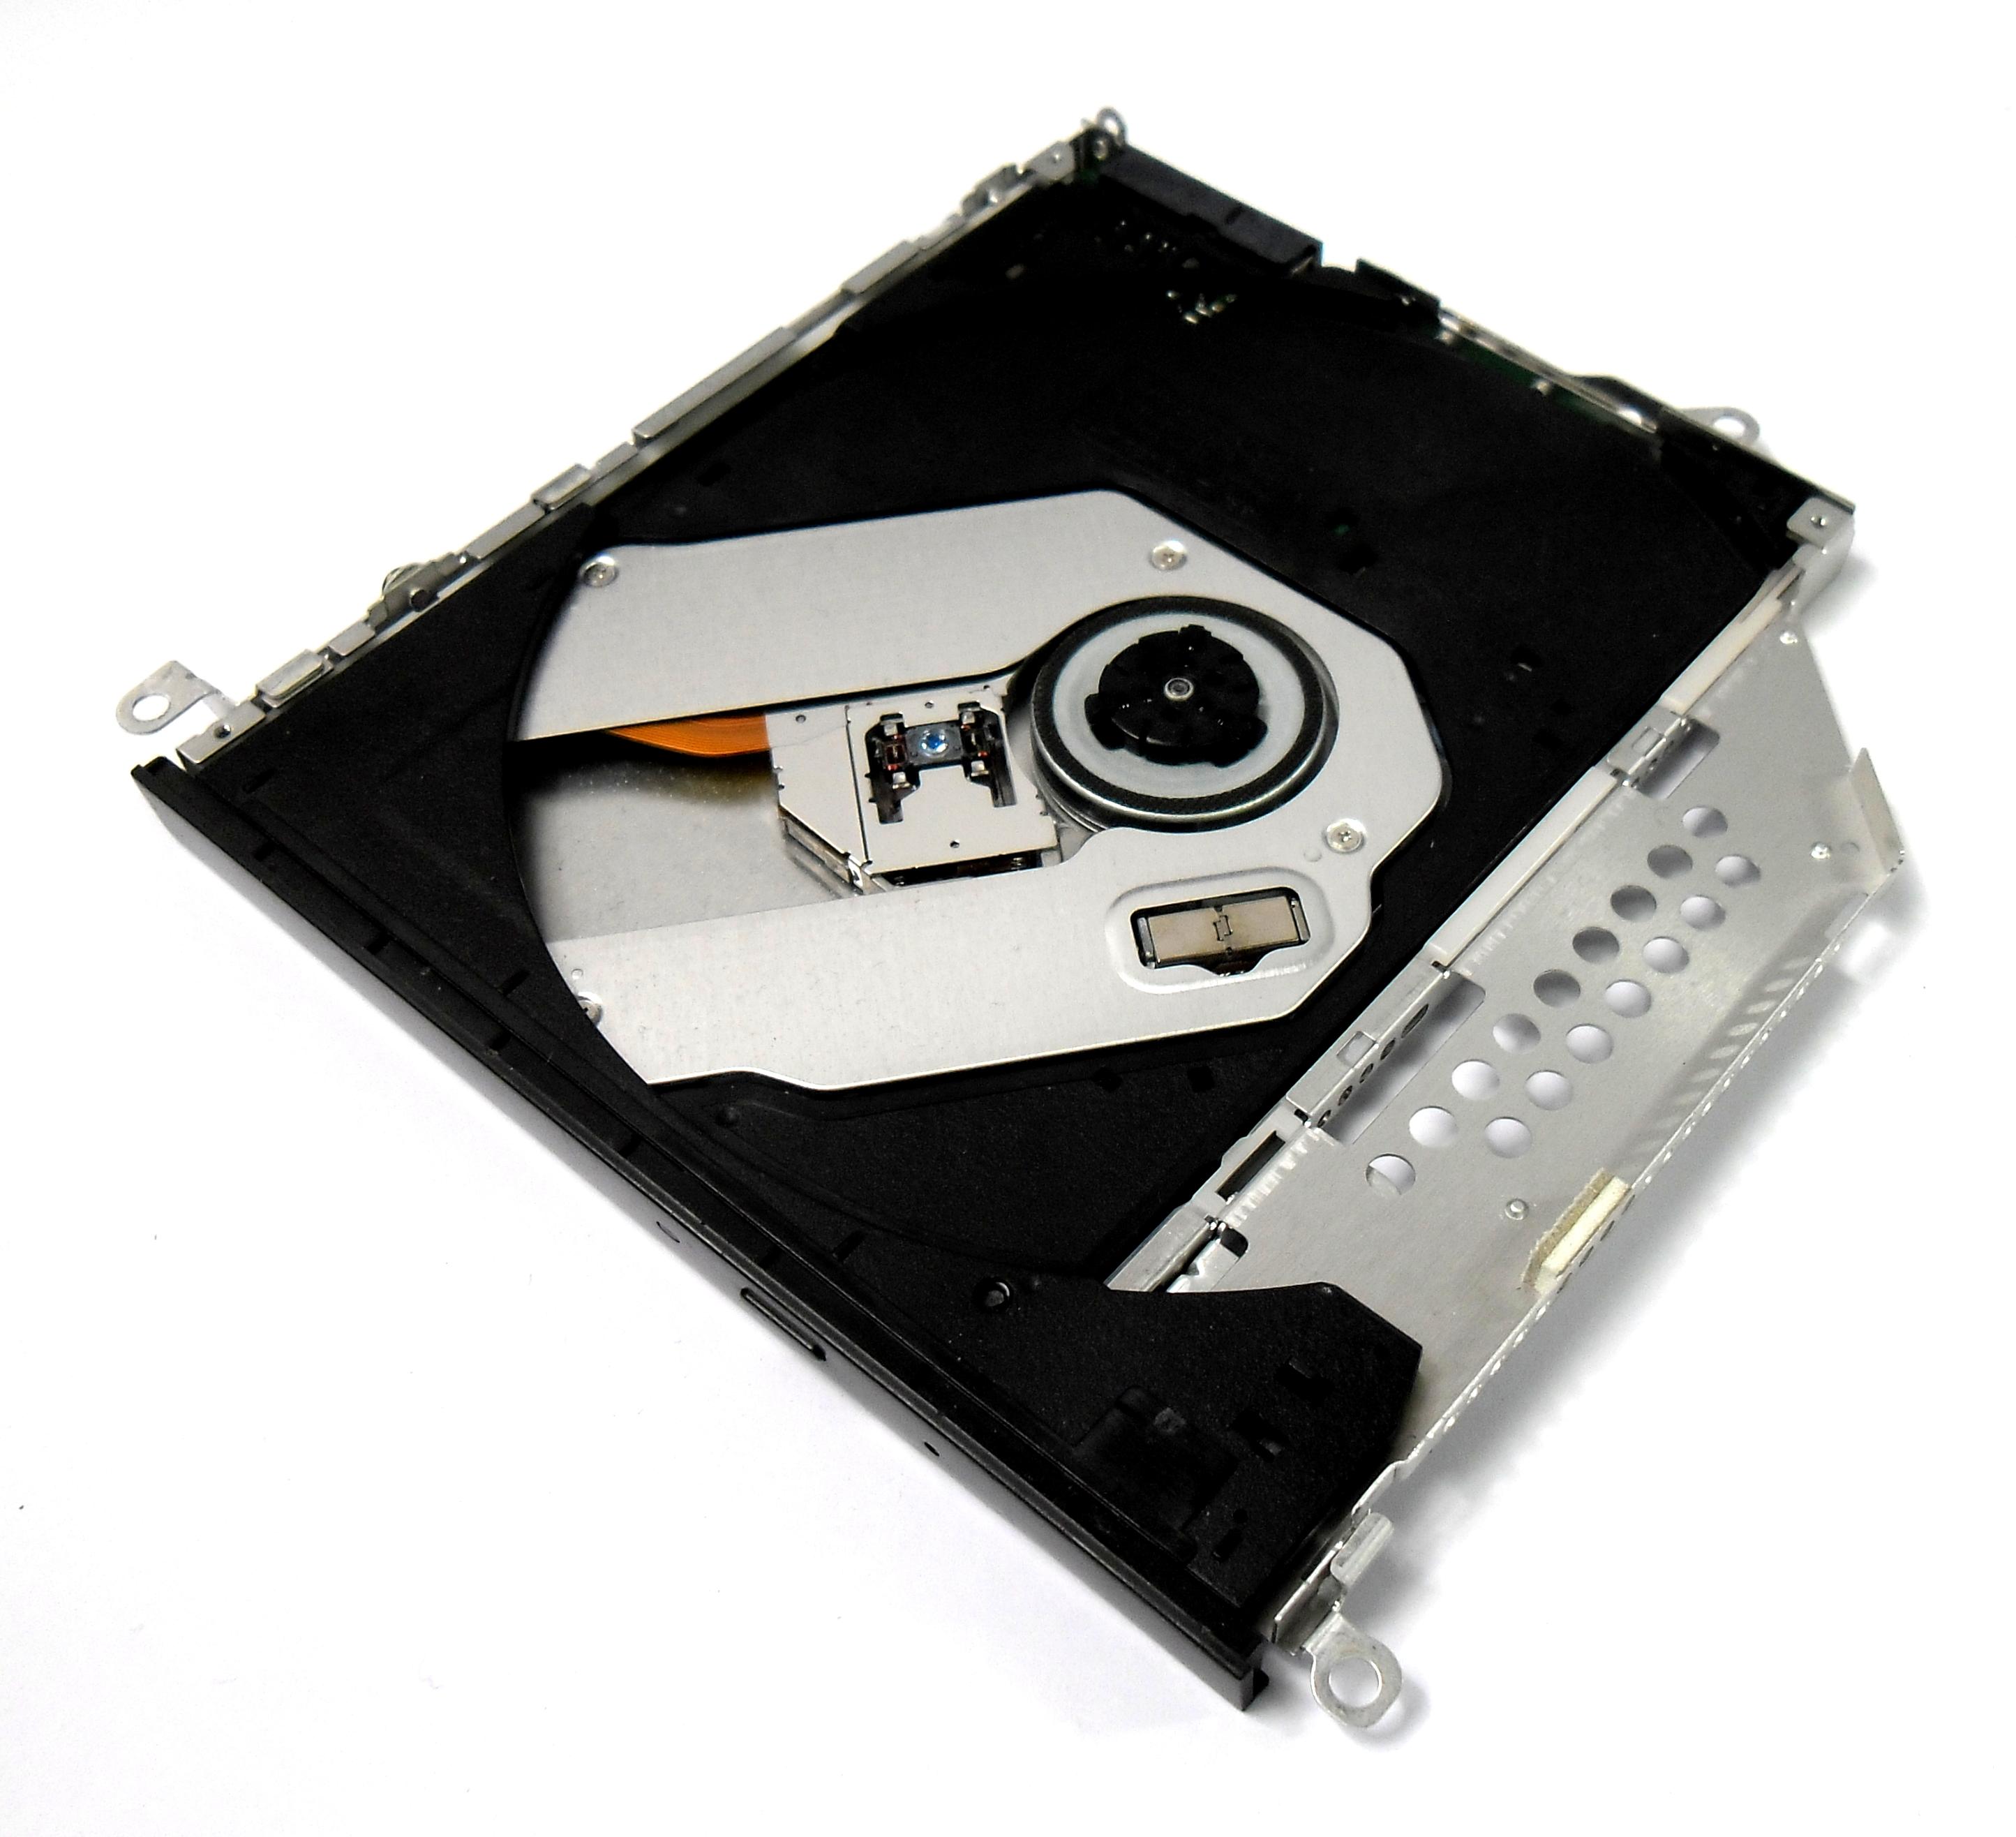 Toshiba G8CC0004UZ3L Portege R700 DVD+/-RW Slim SATA Drive - UJ892